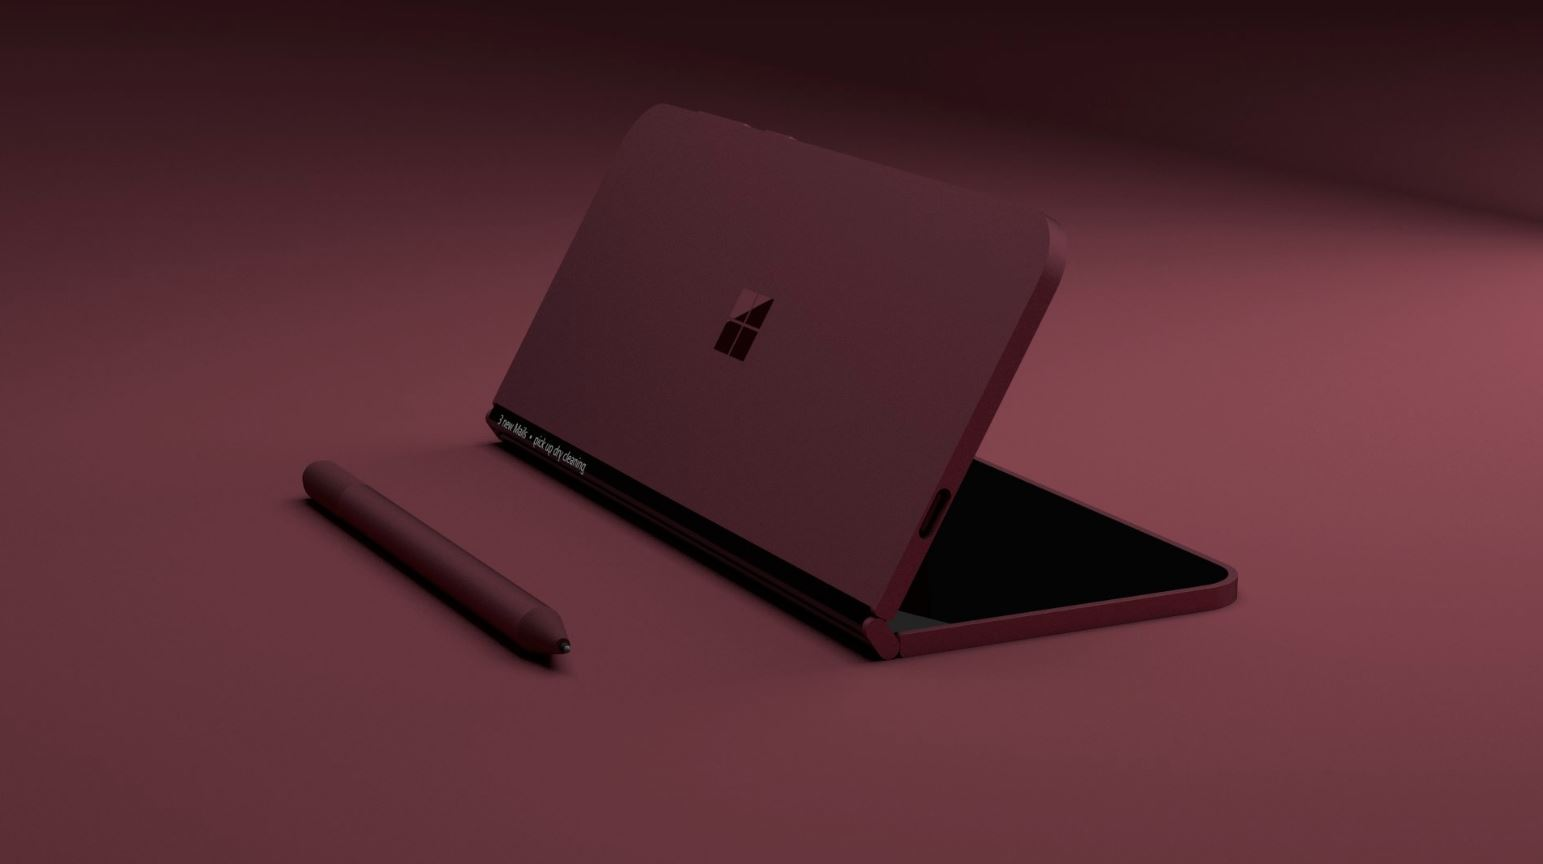 Microsoft Andromeda Concept